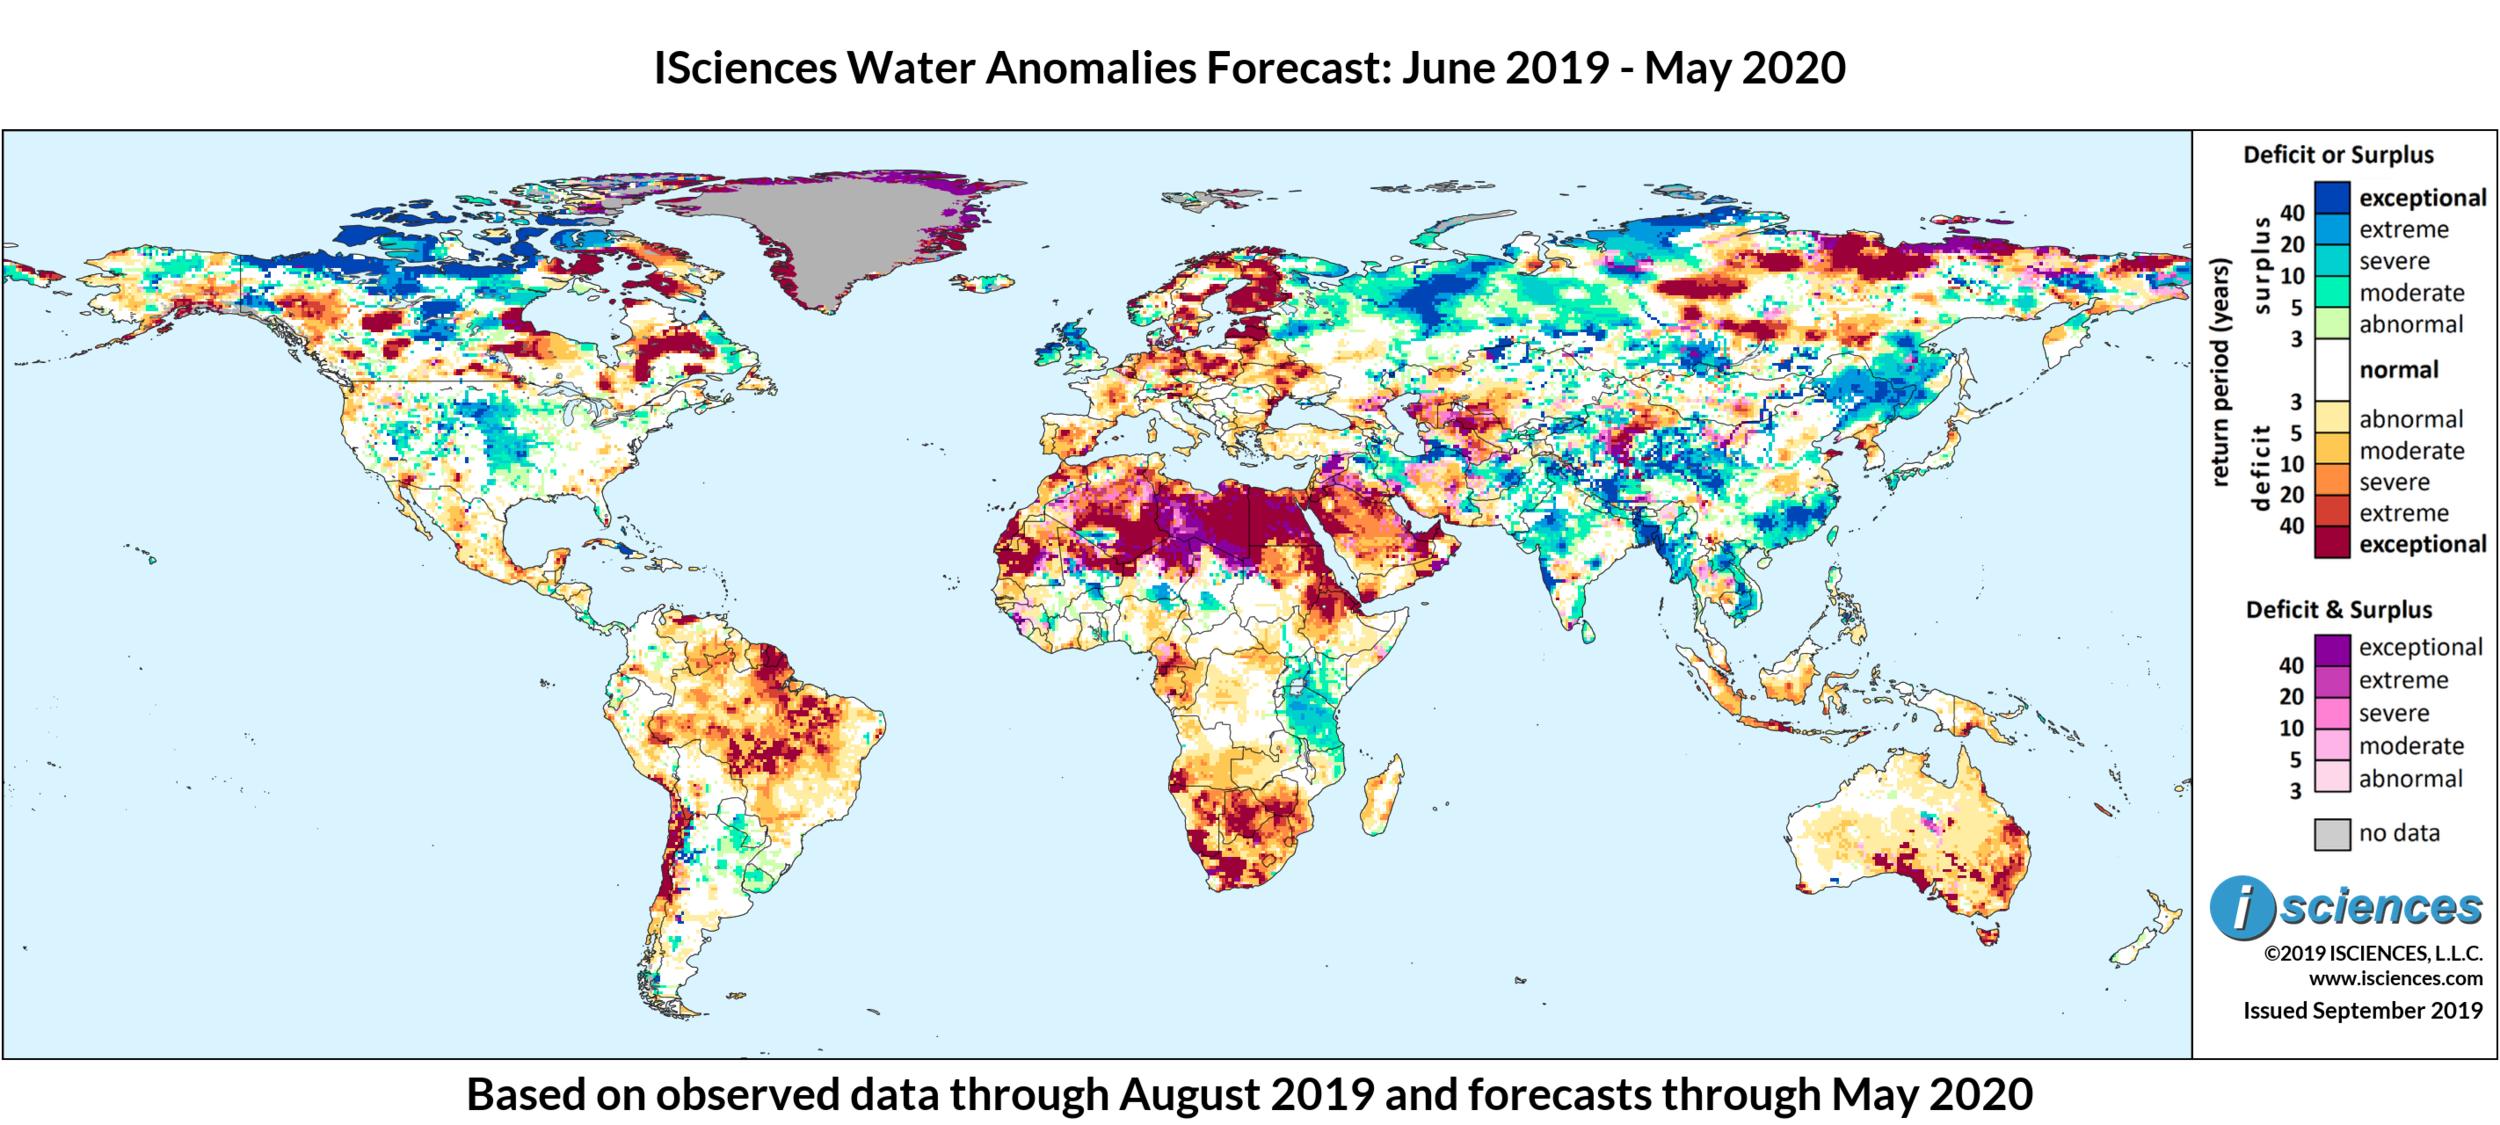 ISciences_Worldwide_Water_Watch_List_201909.png